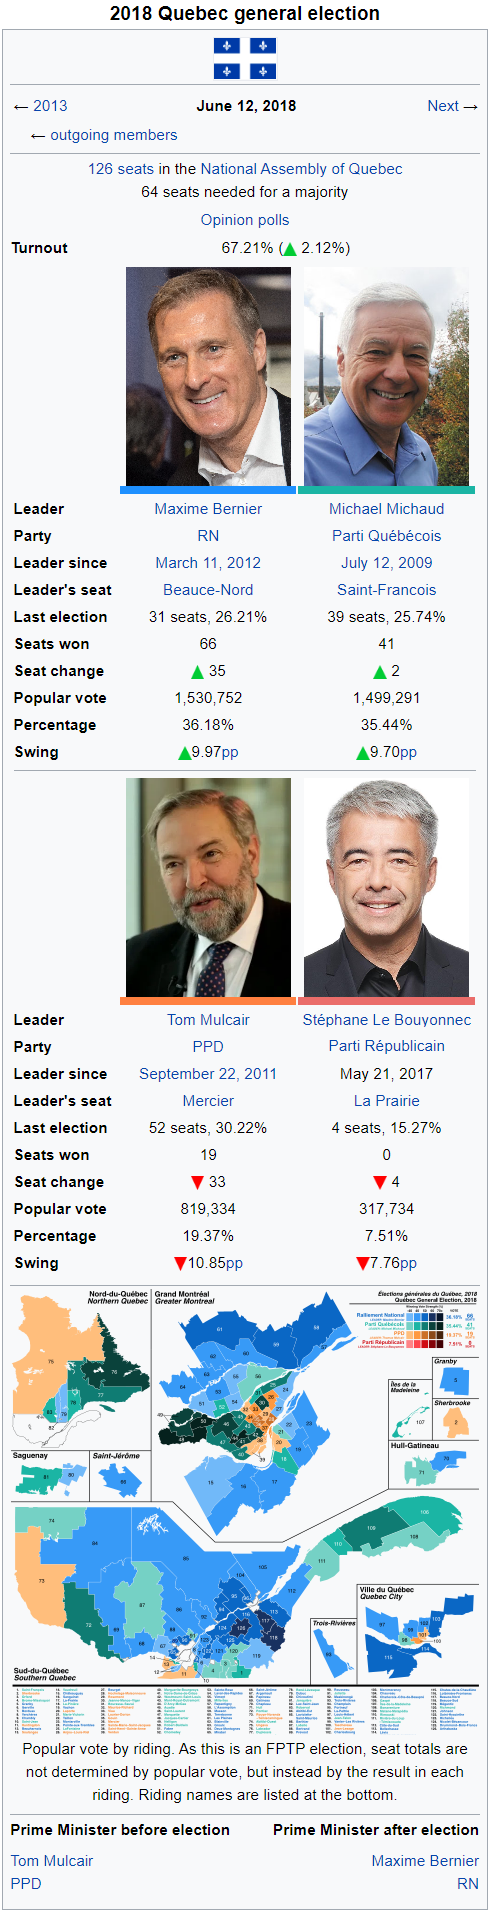 2018 Quebec Election Wiki.png